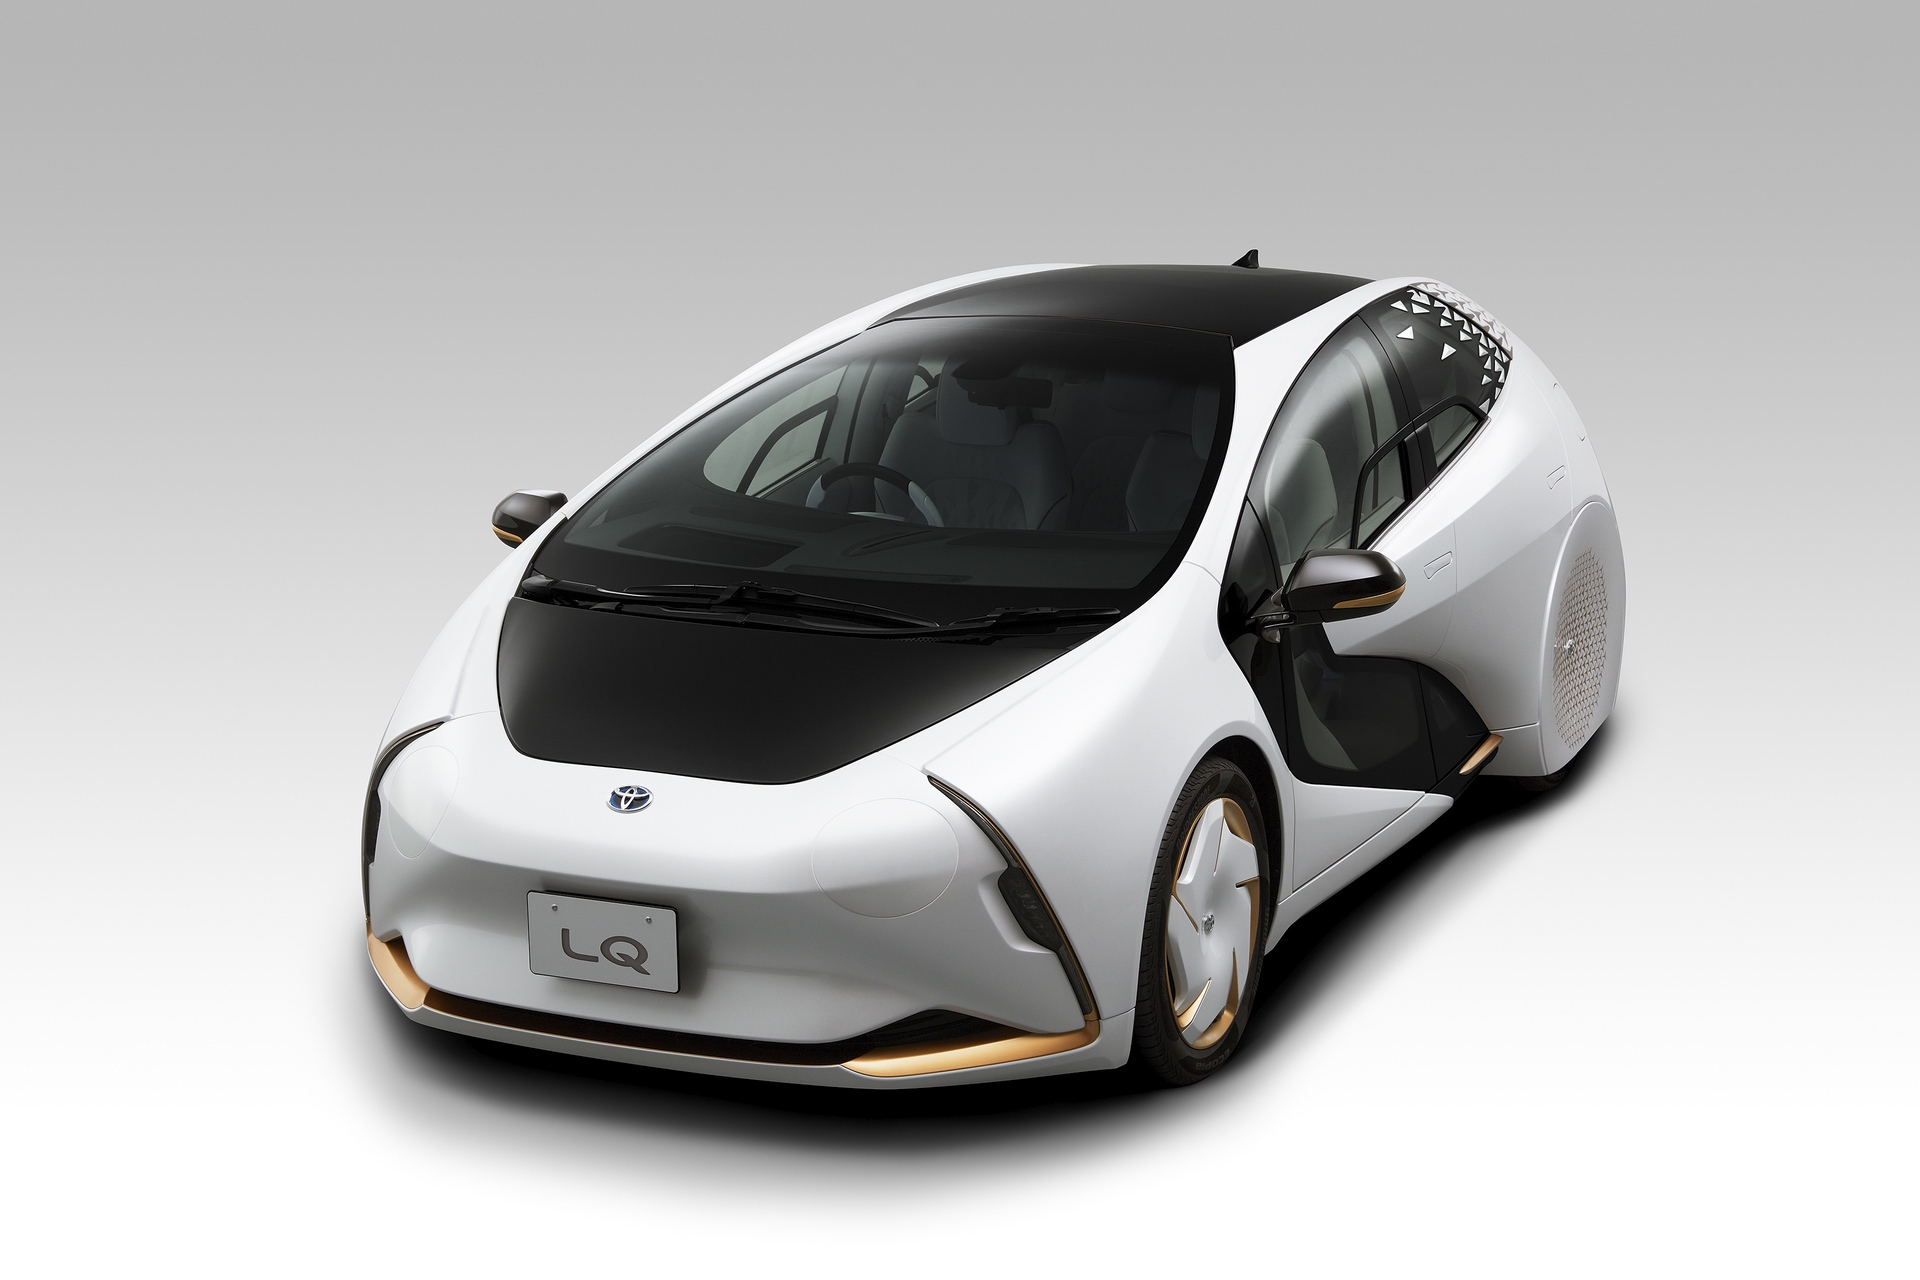 Toyota_LQ_Concept_0000